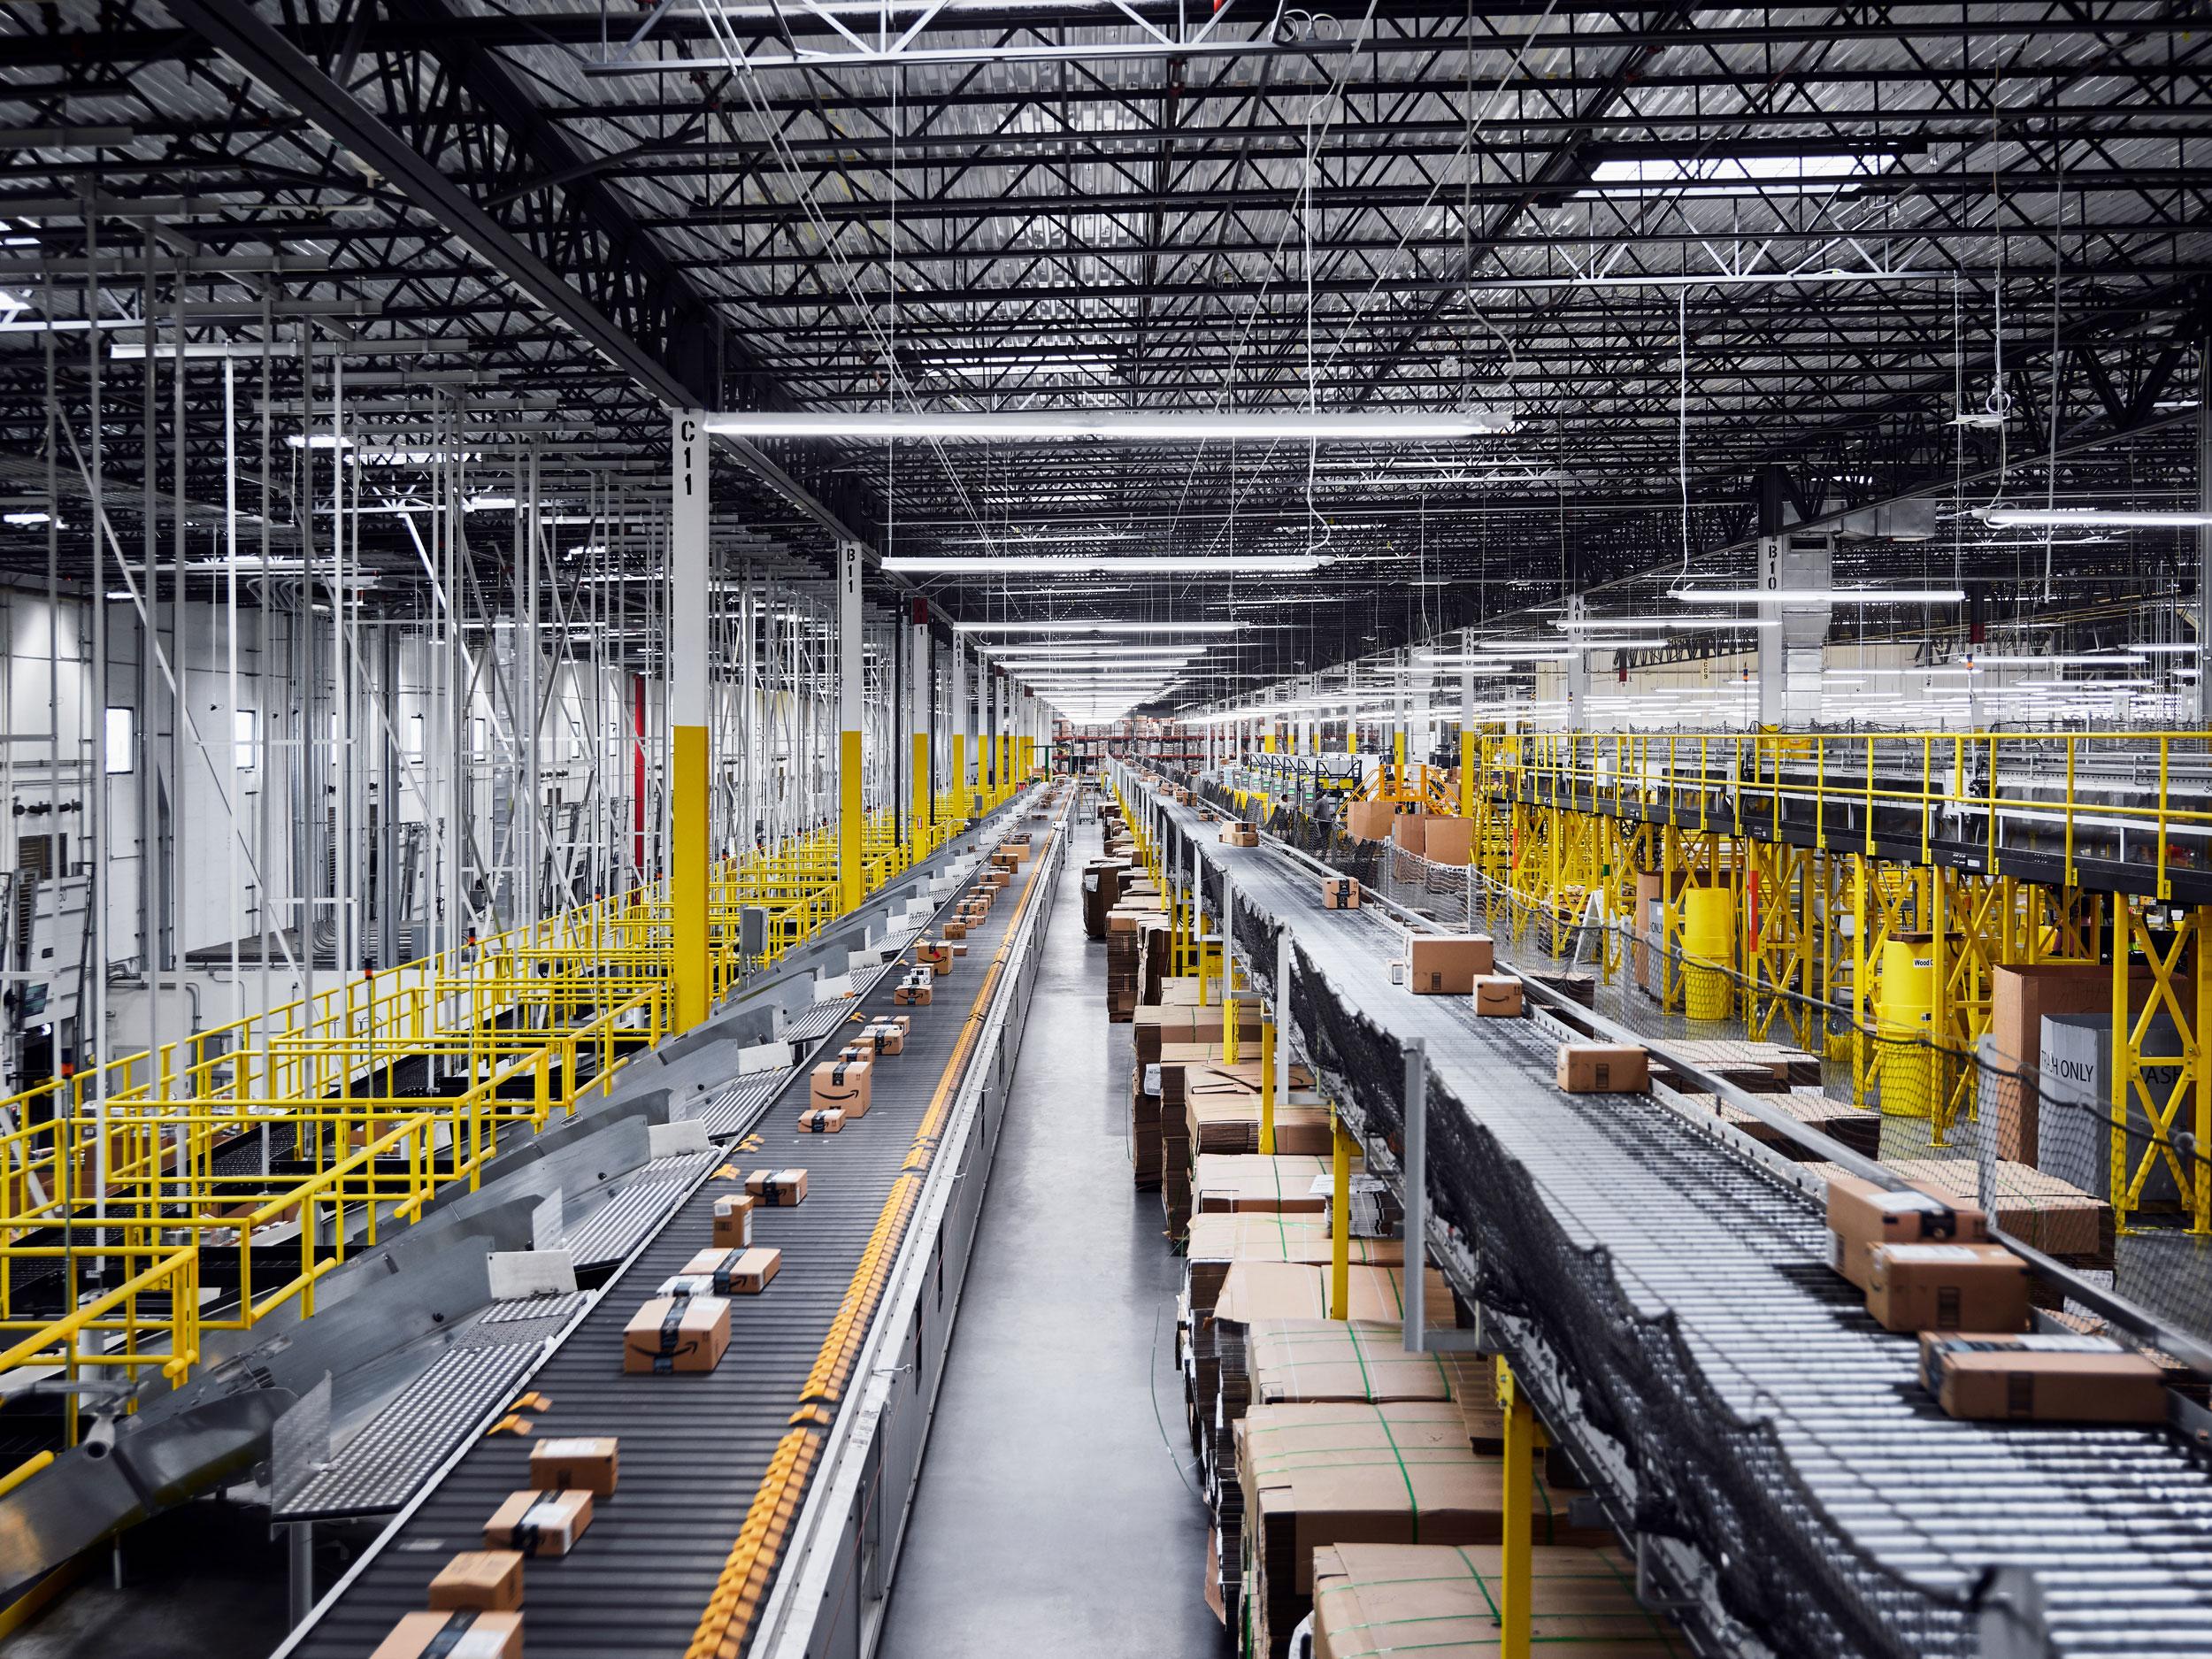 Amazon Fulfillment Center, Baltimore, Maryland, 2018